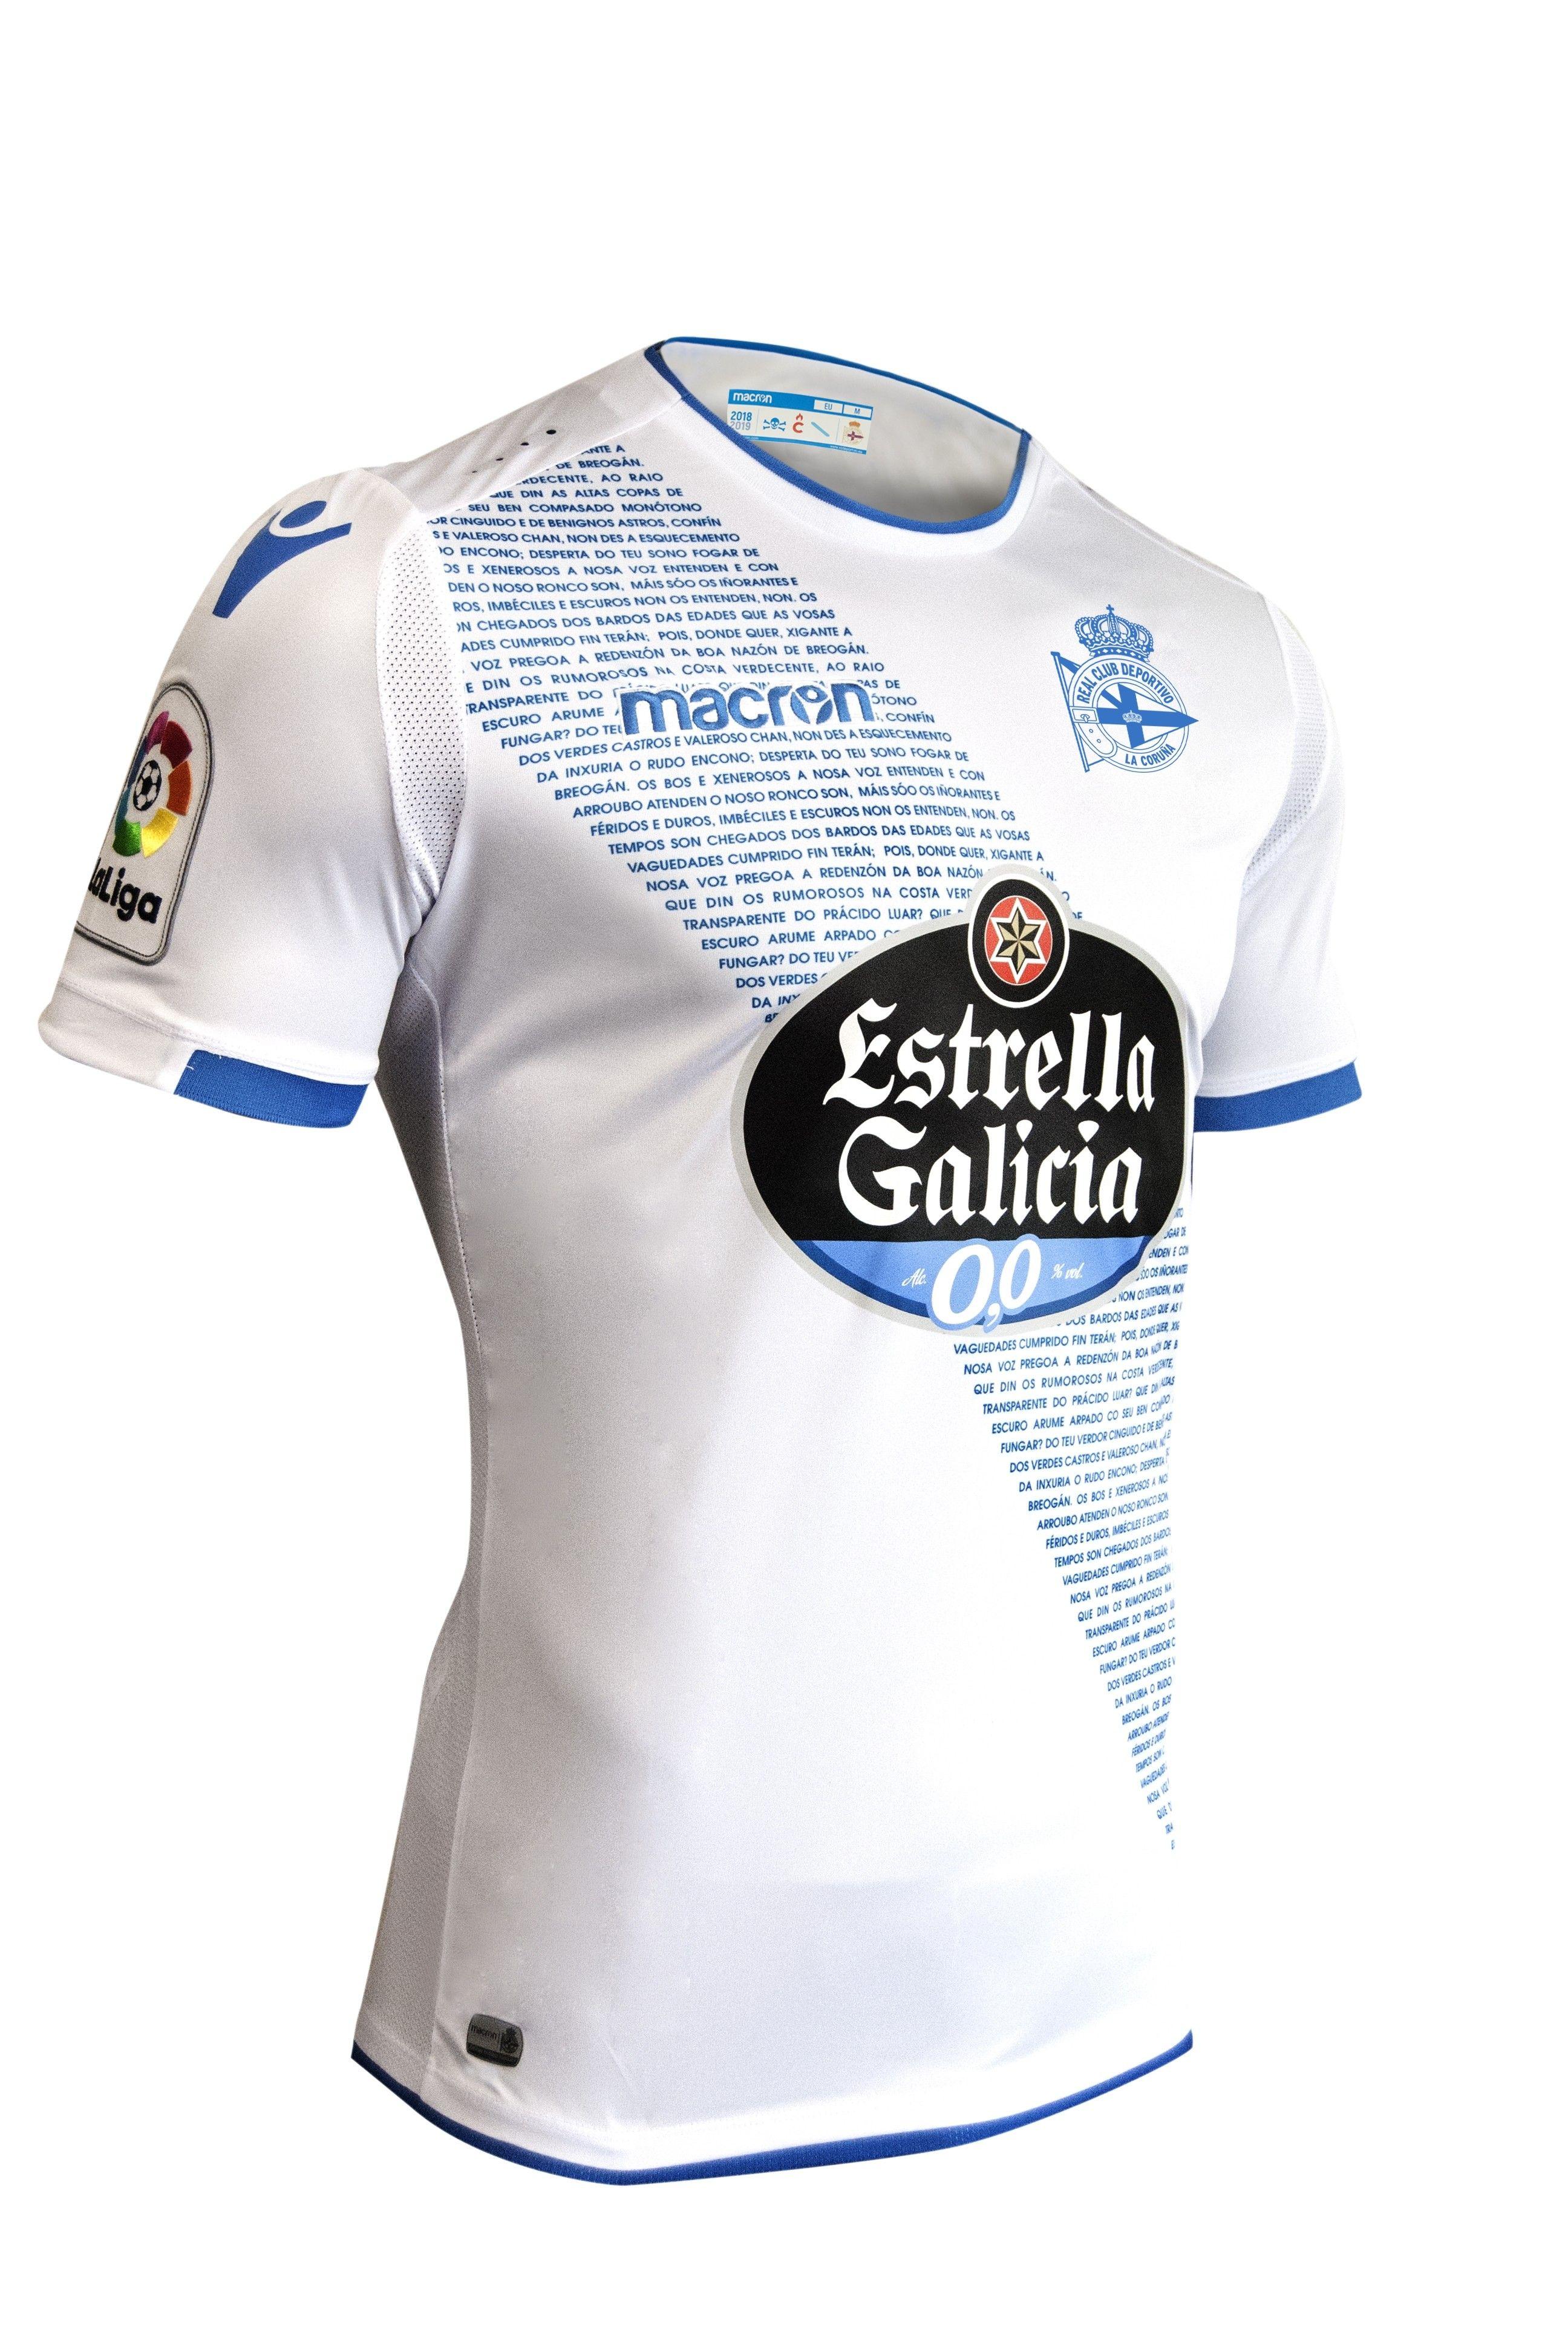 32ec339e25 Deportivo de La Coruña 2018-19 Macron Third Shirt